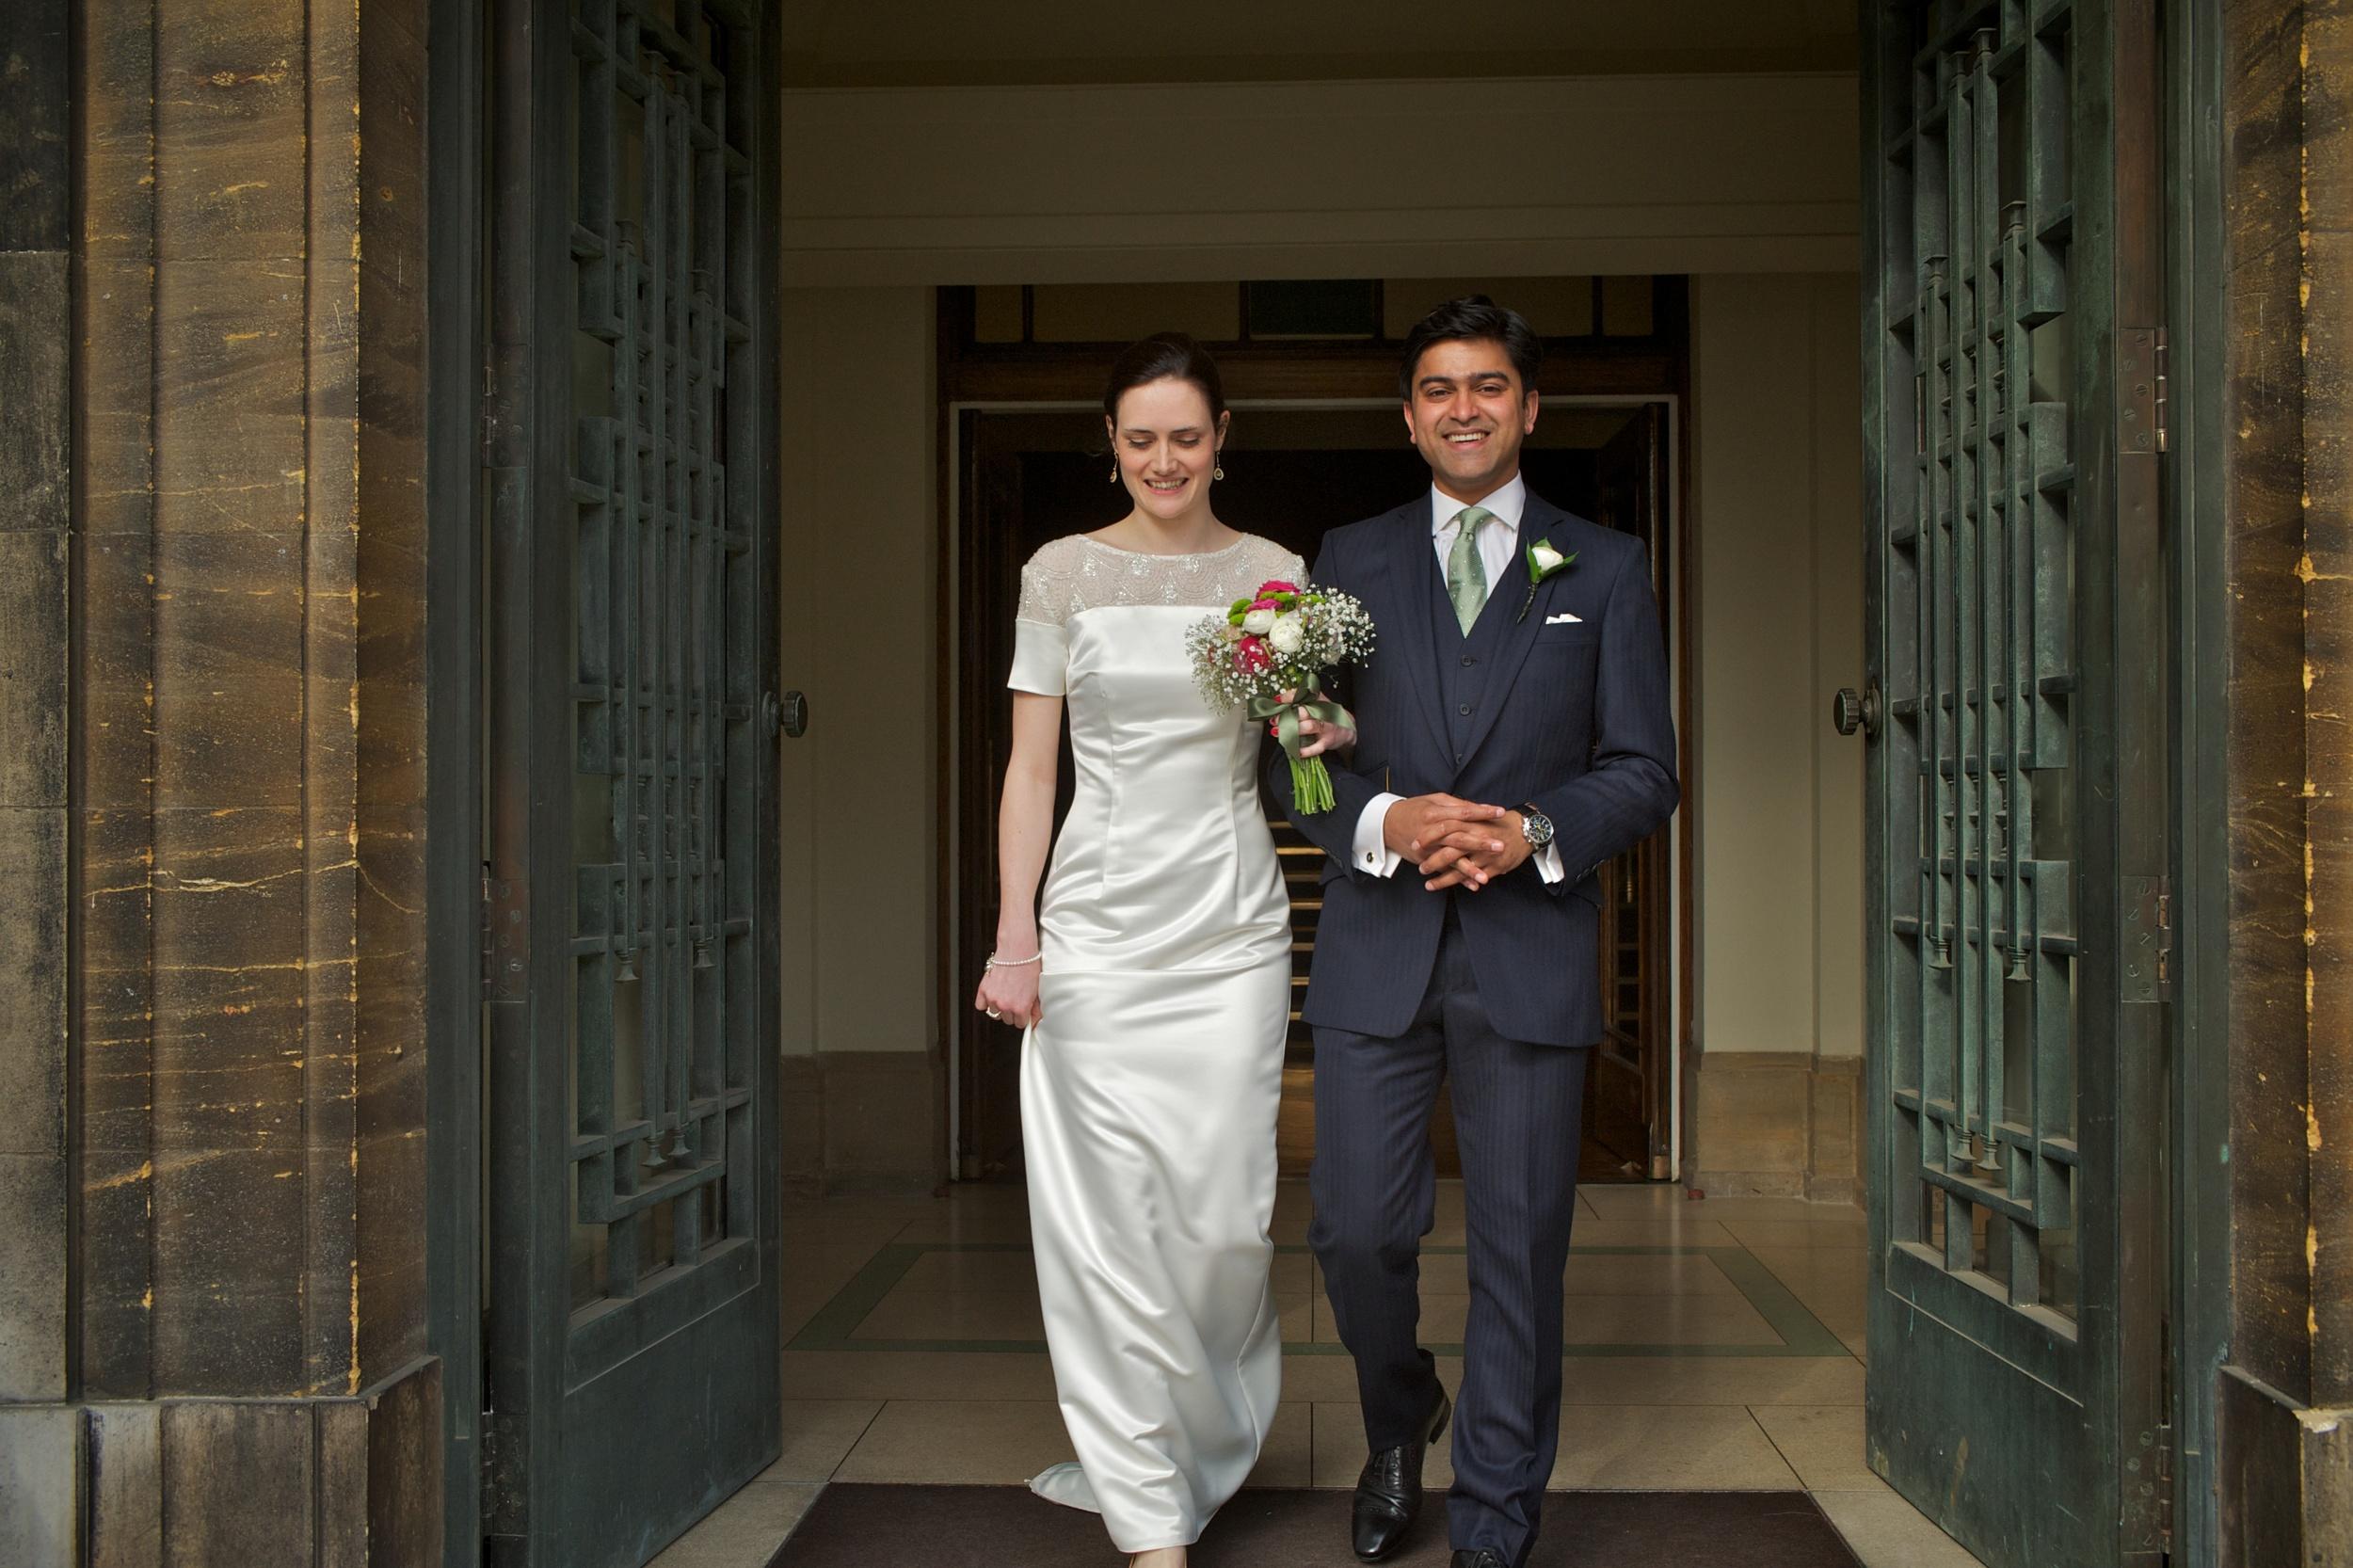 three-piece-suit-vest-waistcoat-navy-herringbone-wool-bespoke-all-uk-made-wedding.jpg